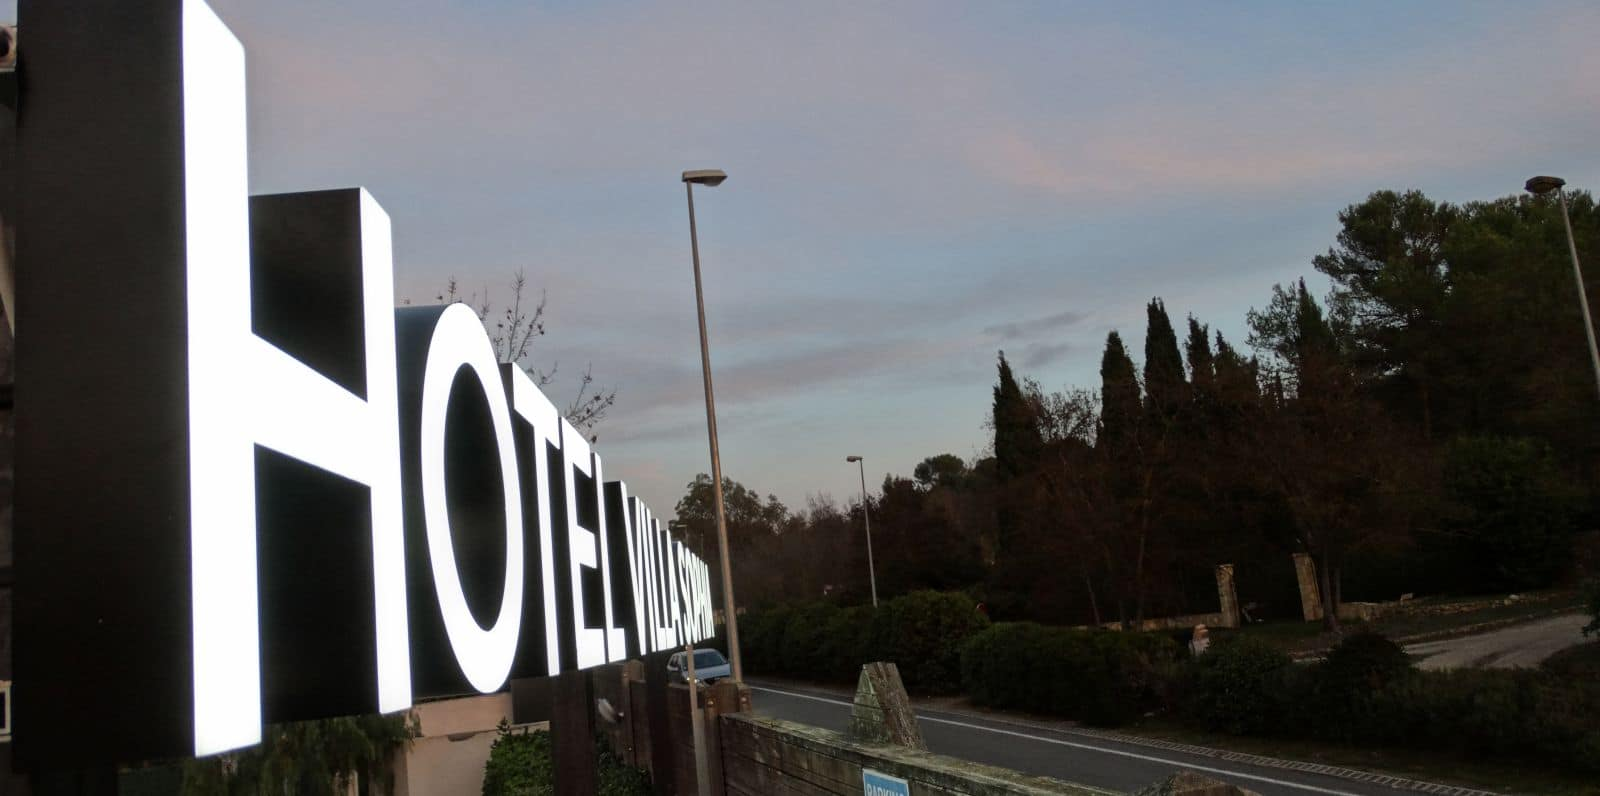 enseigne-metal-hotels-sophia-antipolis-hotel-villa-sophia-2